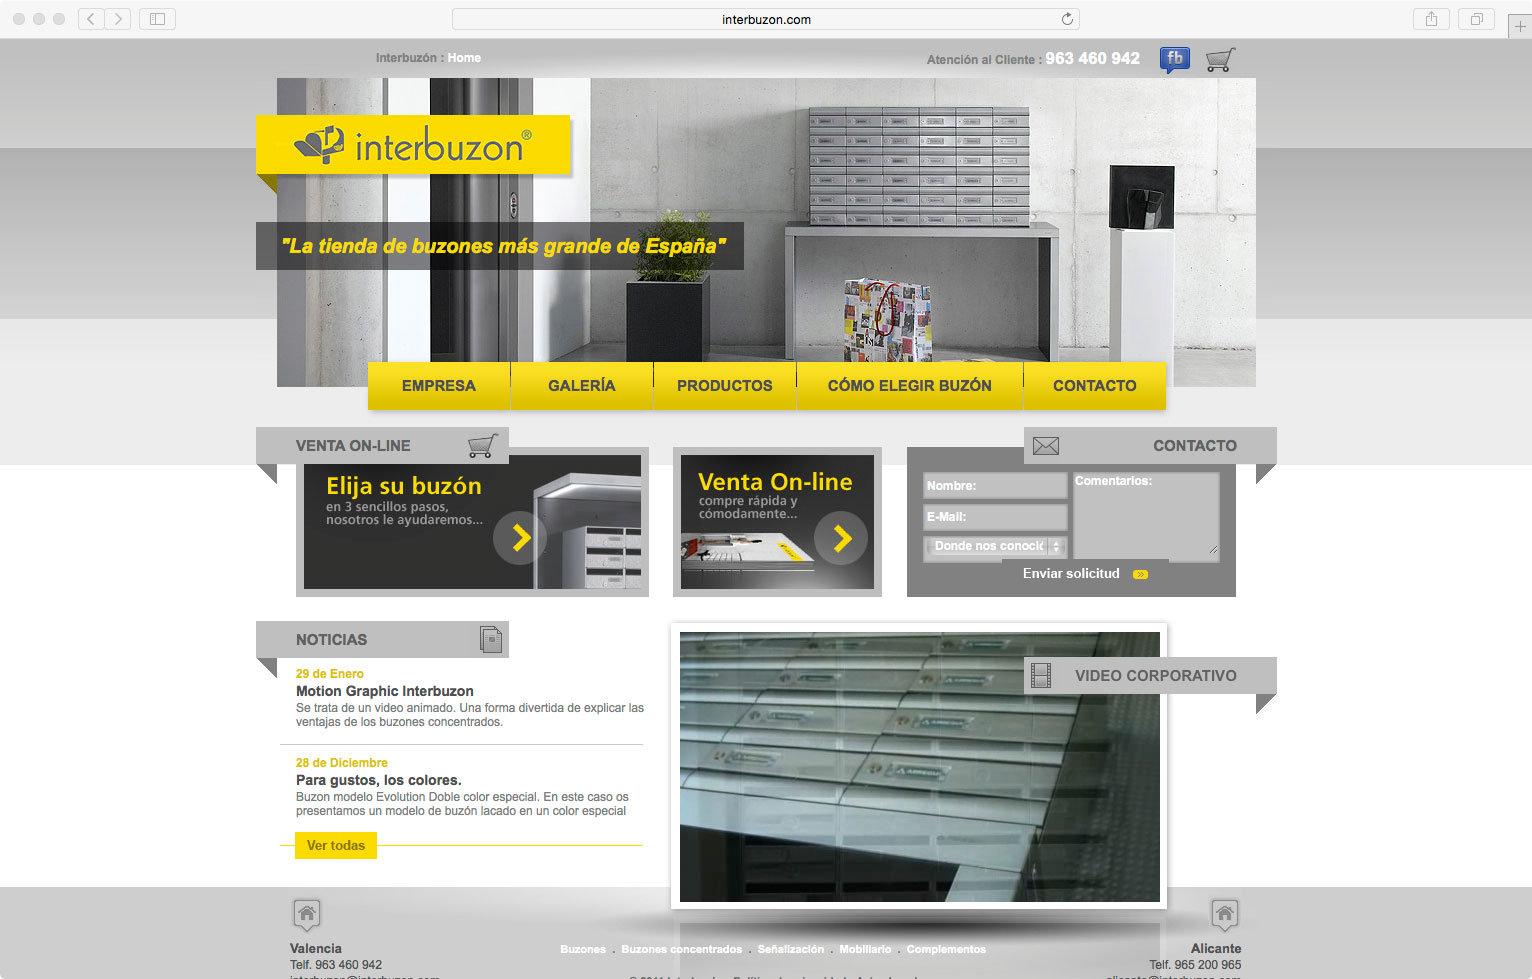 wellaggio diseño web valencia interbuzon